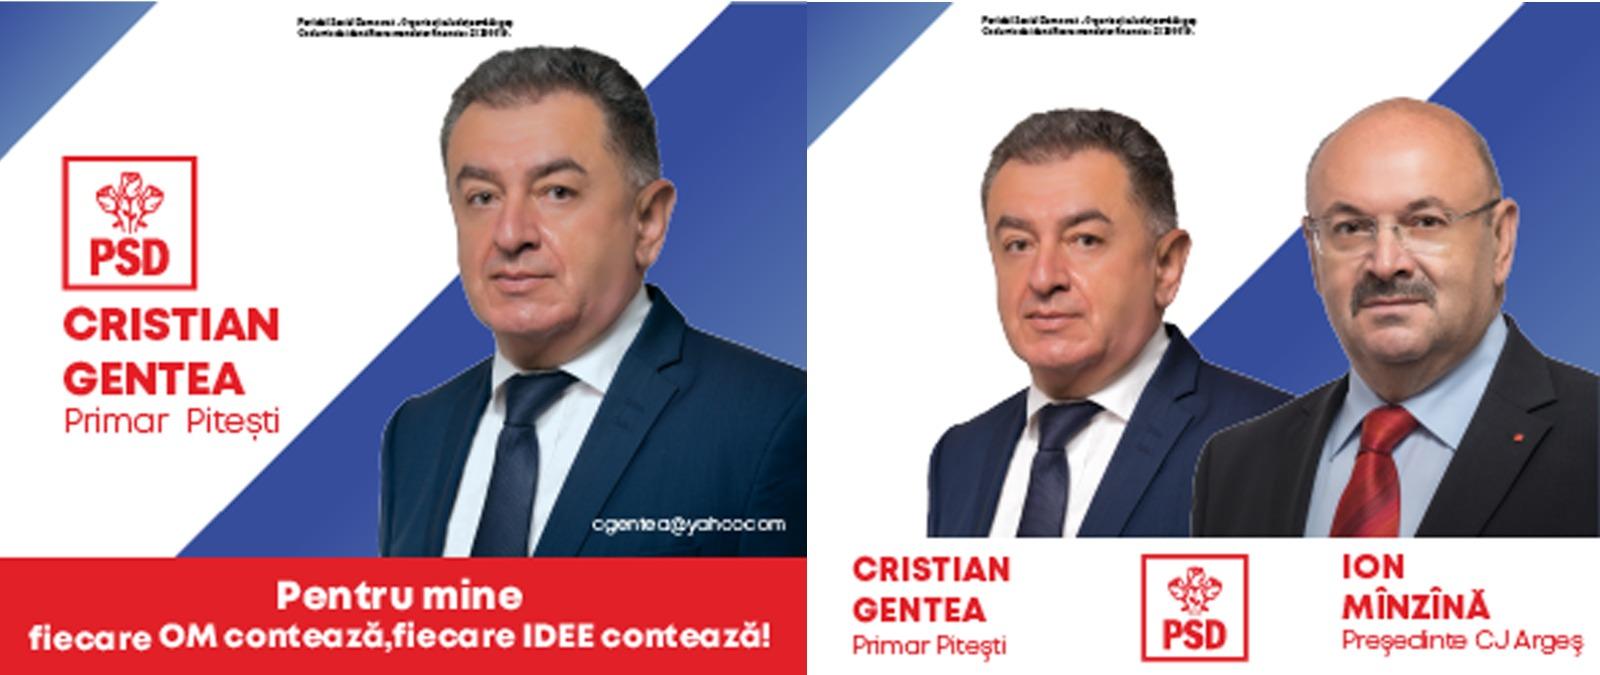 Gentea&Manzana PSD lateral Campanie Electorala